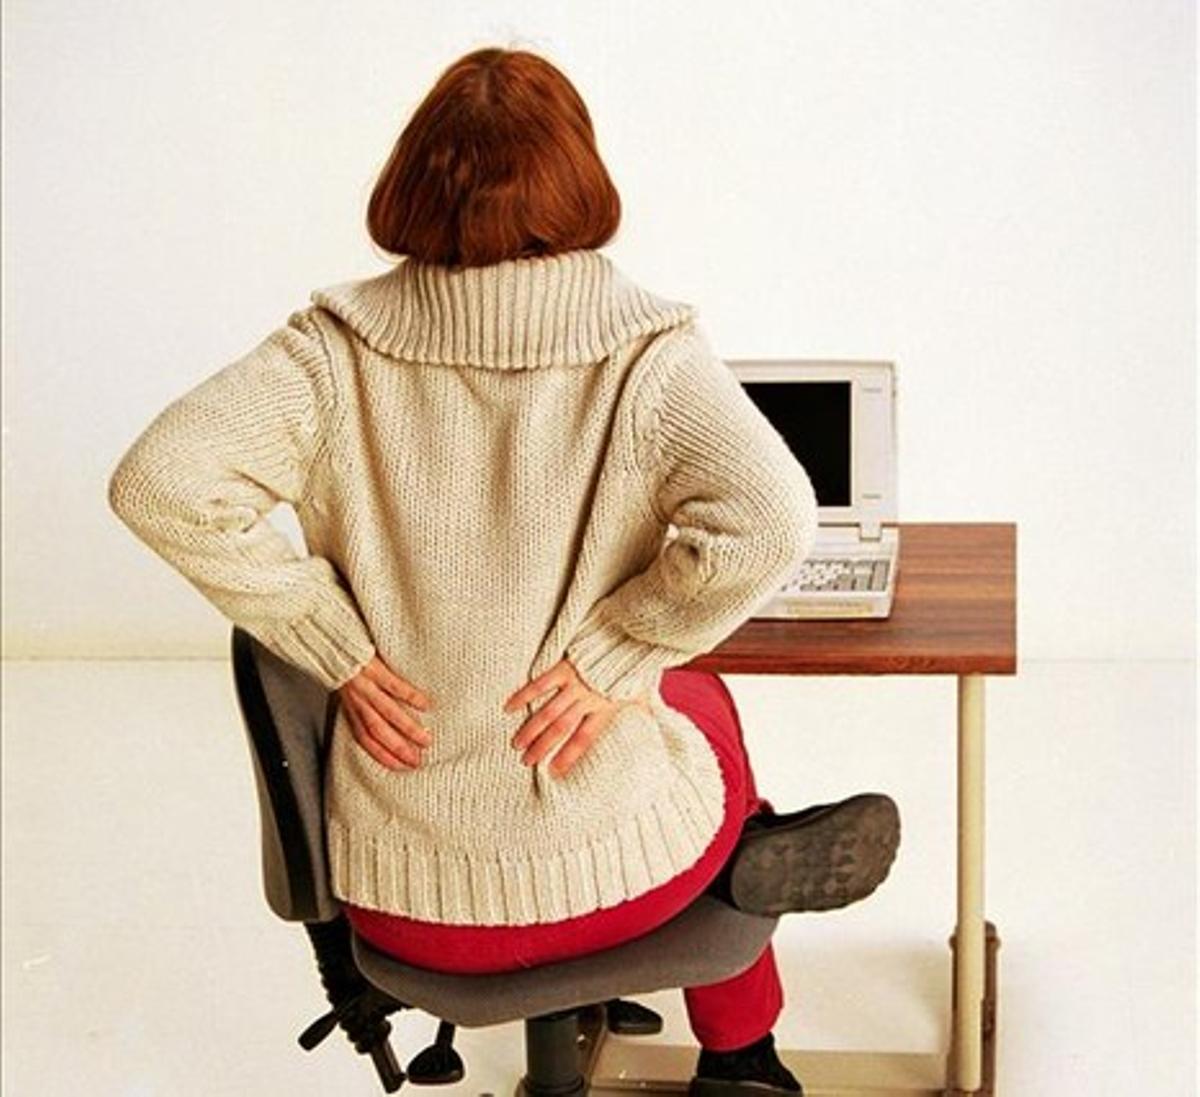 Una mala postura corporal